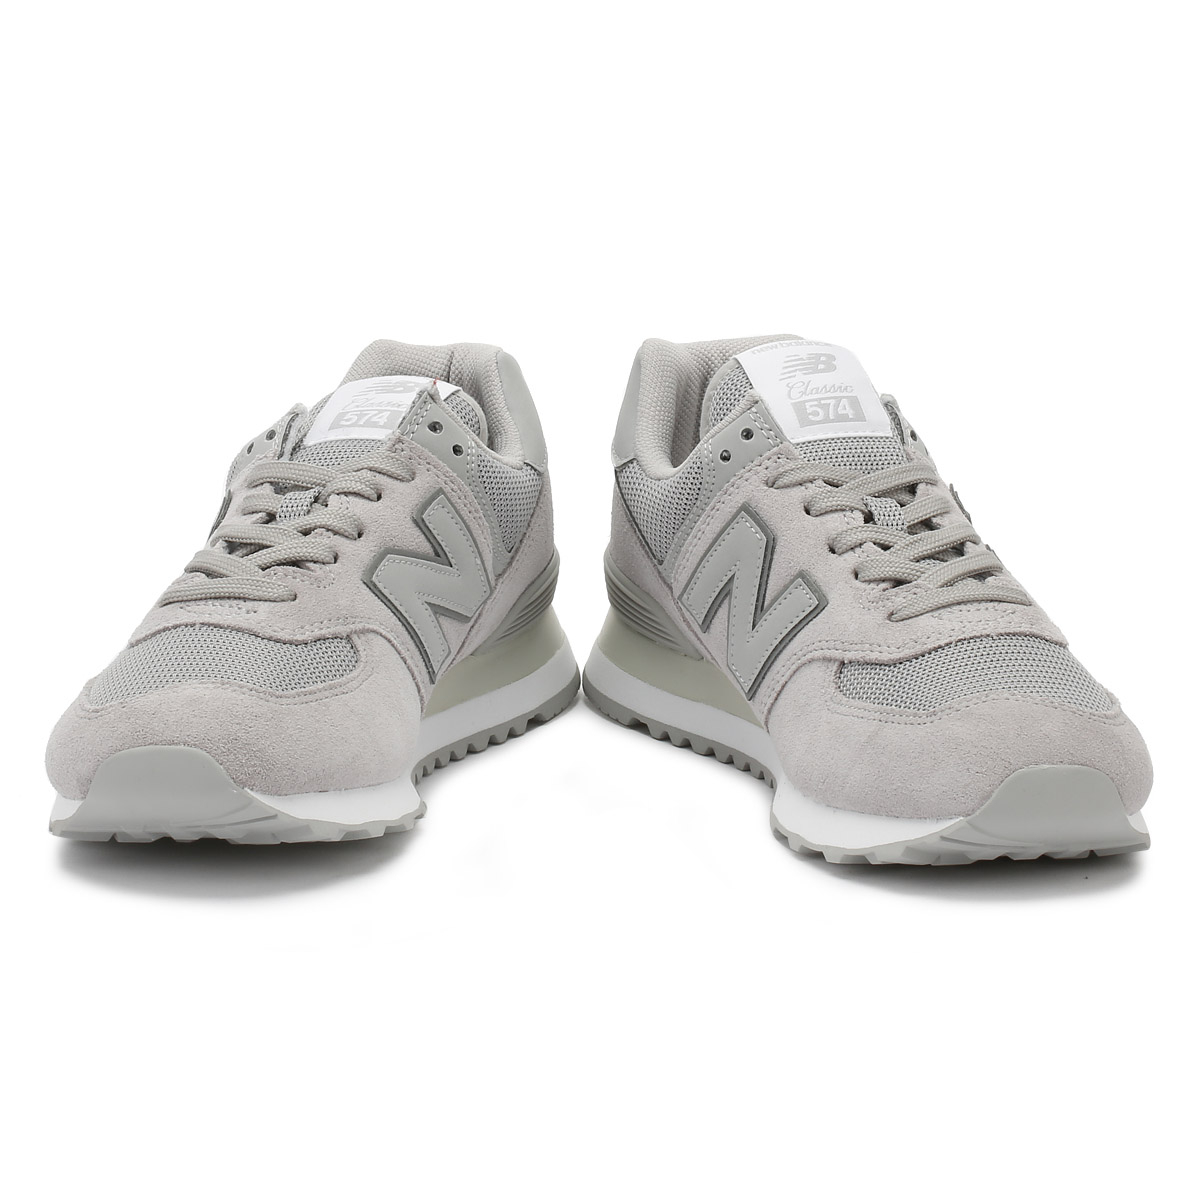 New Balance  Uomo Trainers Rain Cloud Grau Sport 574 Classic Lace Up Sport Grau Casual Schuhes 264720